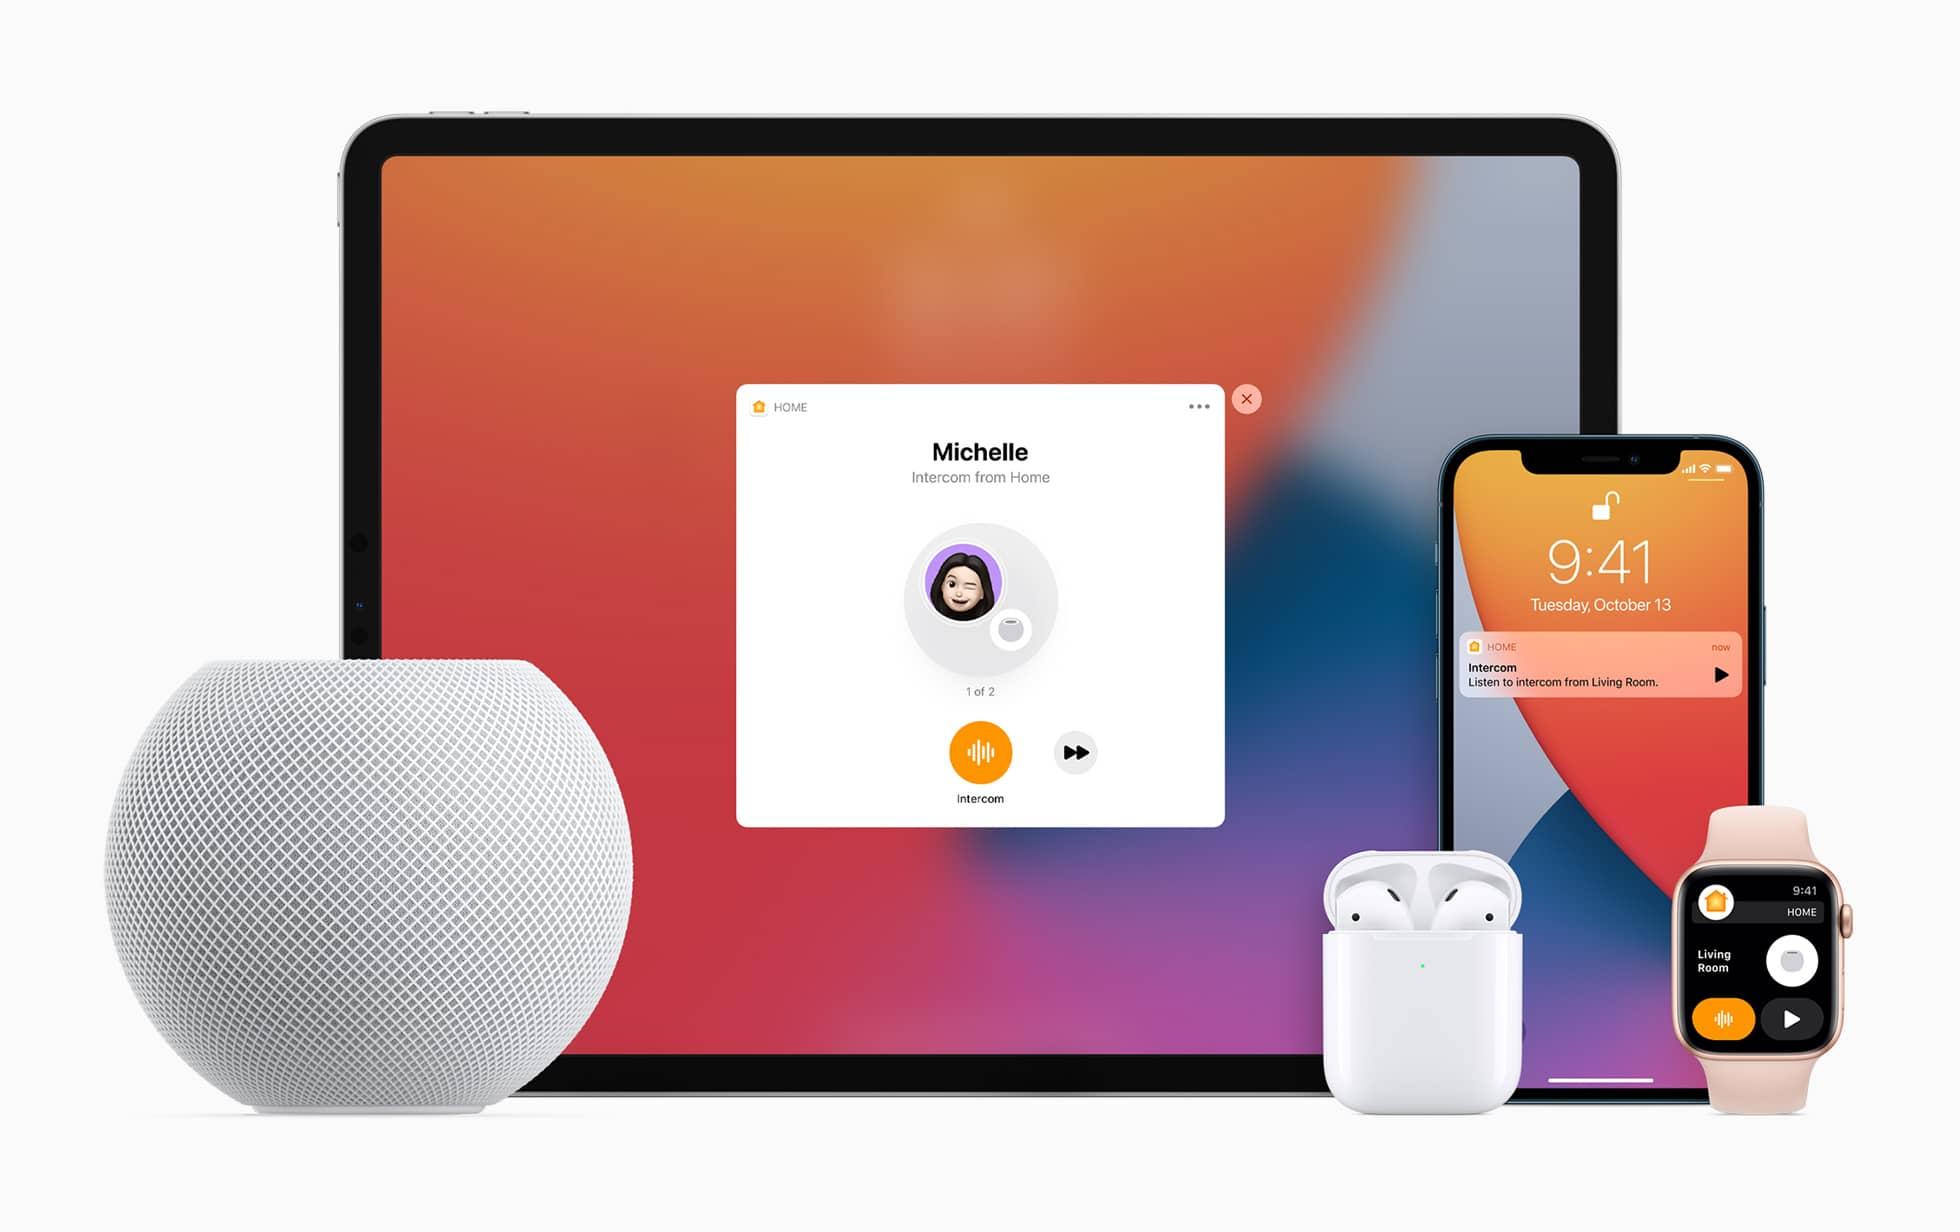 Apple HomePod mini iPad iPhone applewatch airpods 10132020